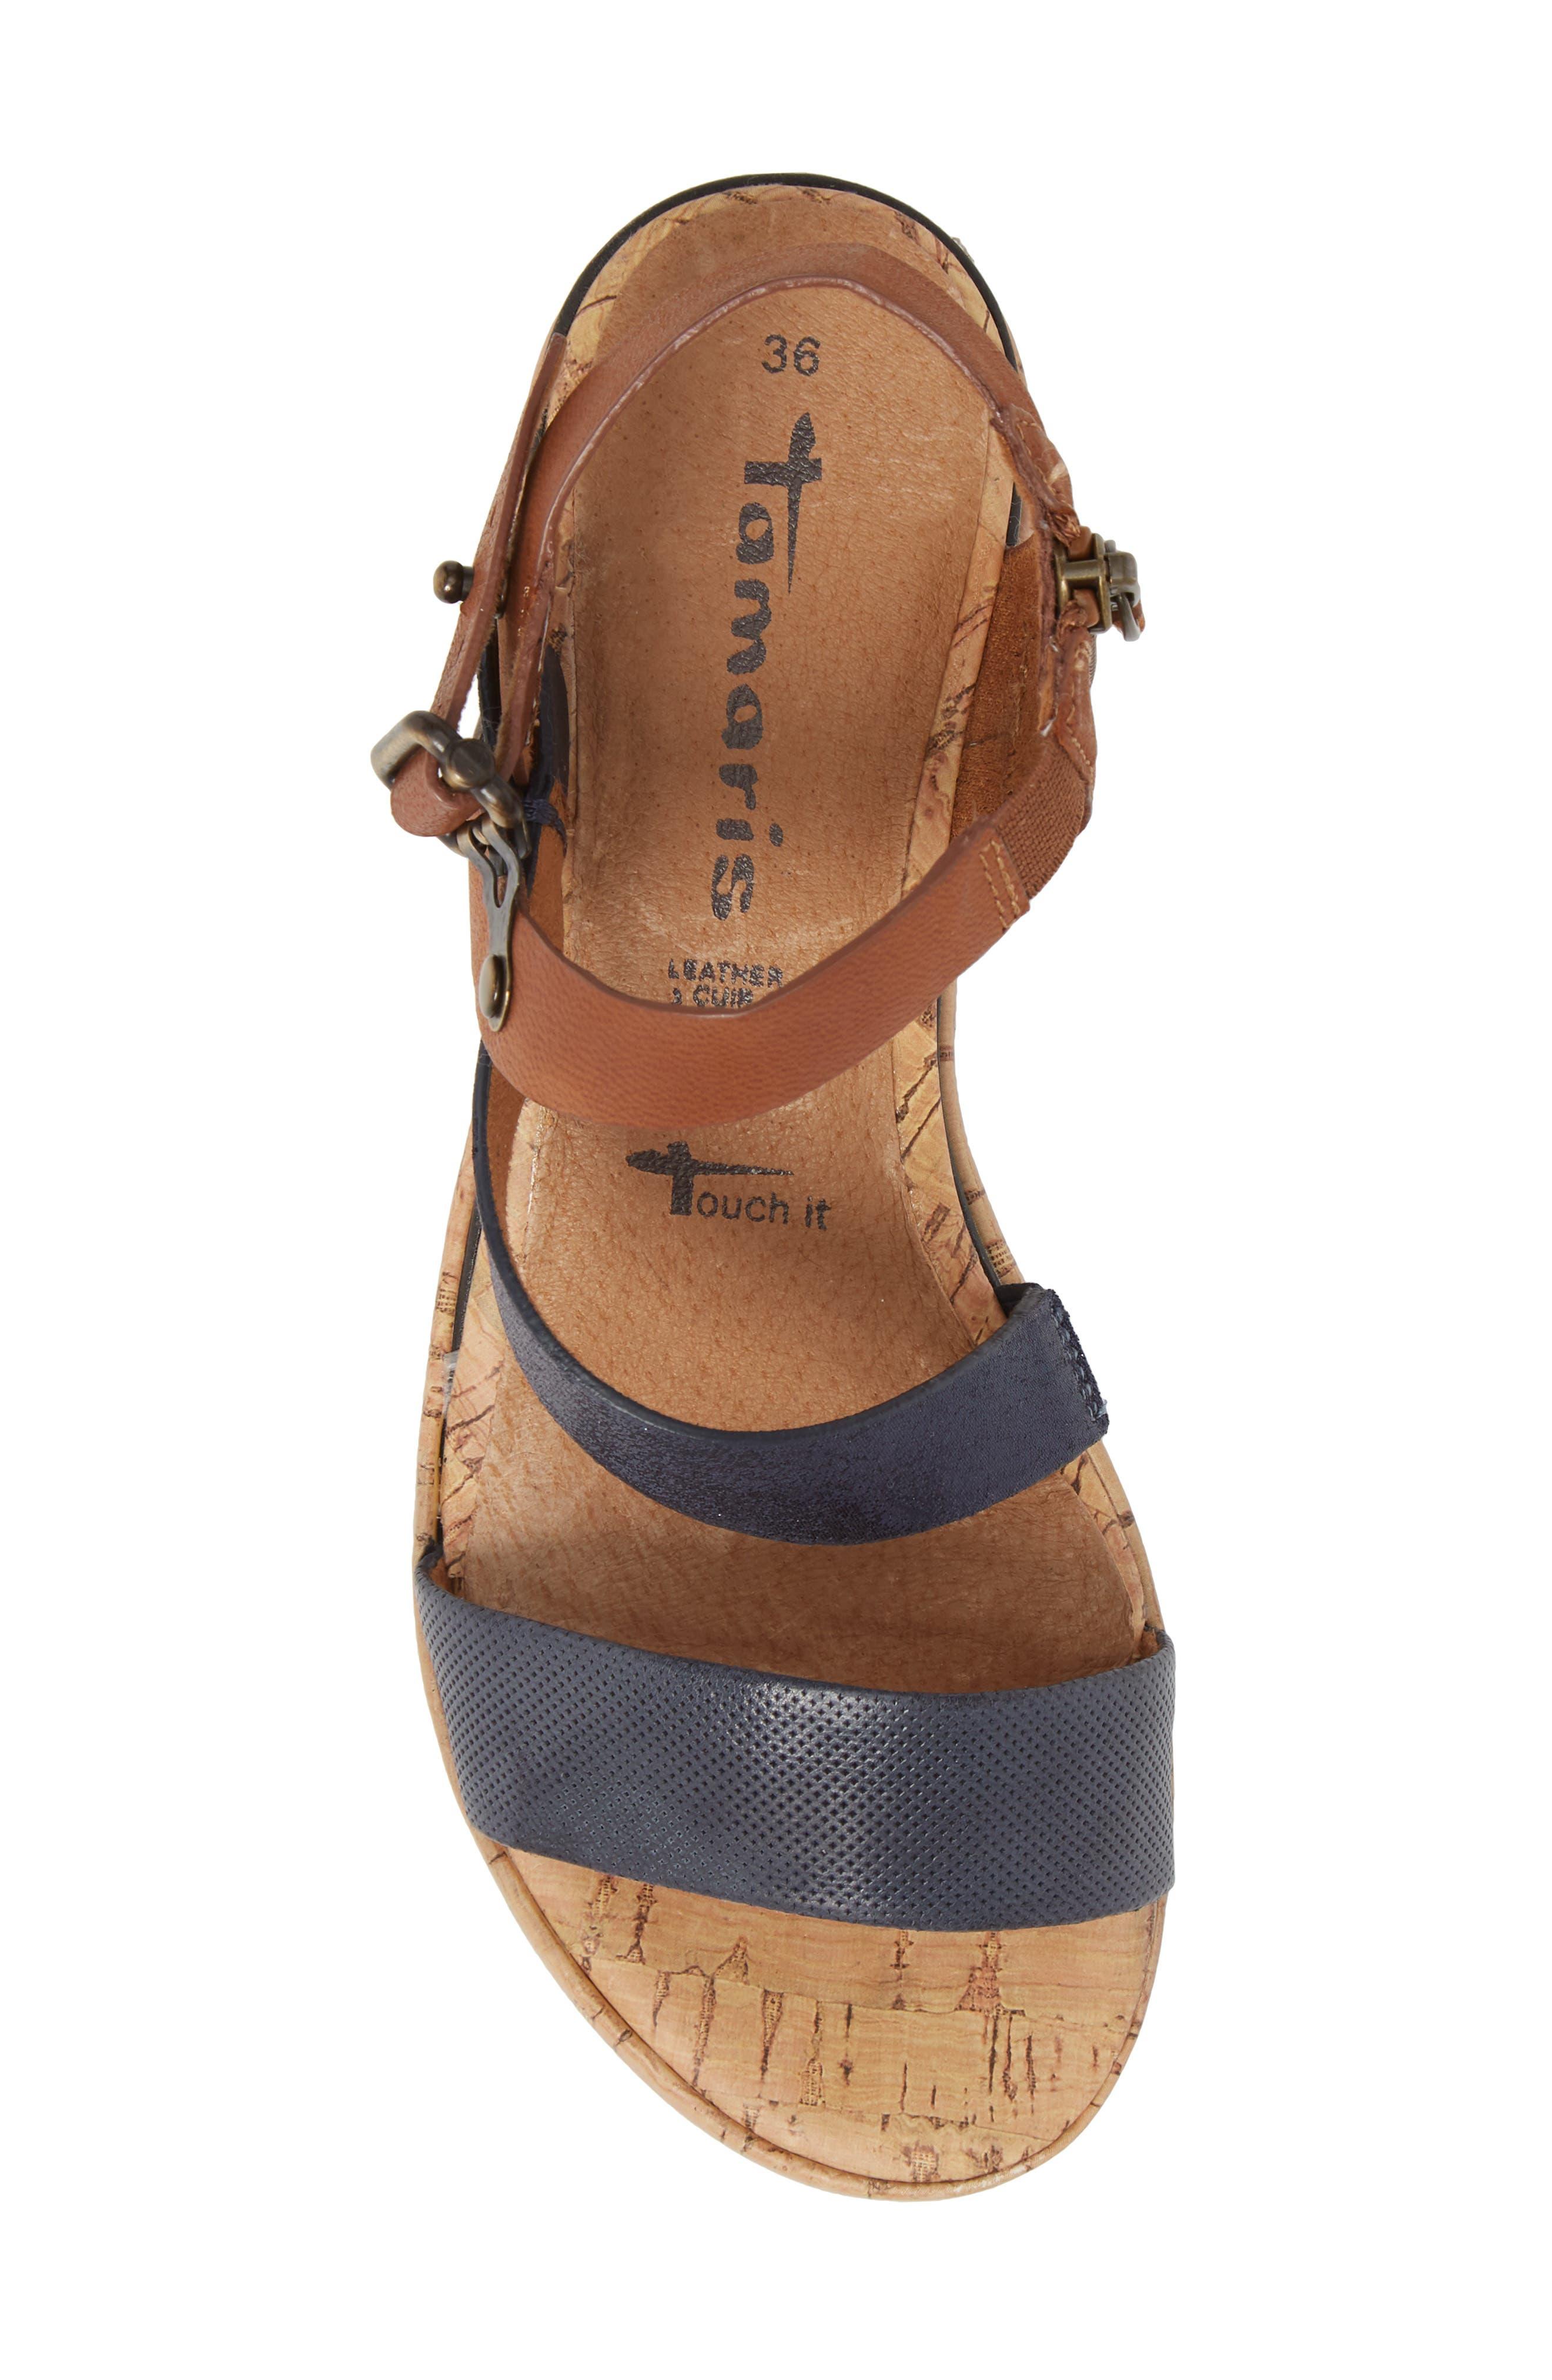 Eda Diagonal Strap Wedge Sandal,                             Alternate thumbnail 5, color,                             Navy/ Cognac Leather